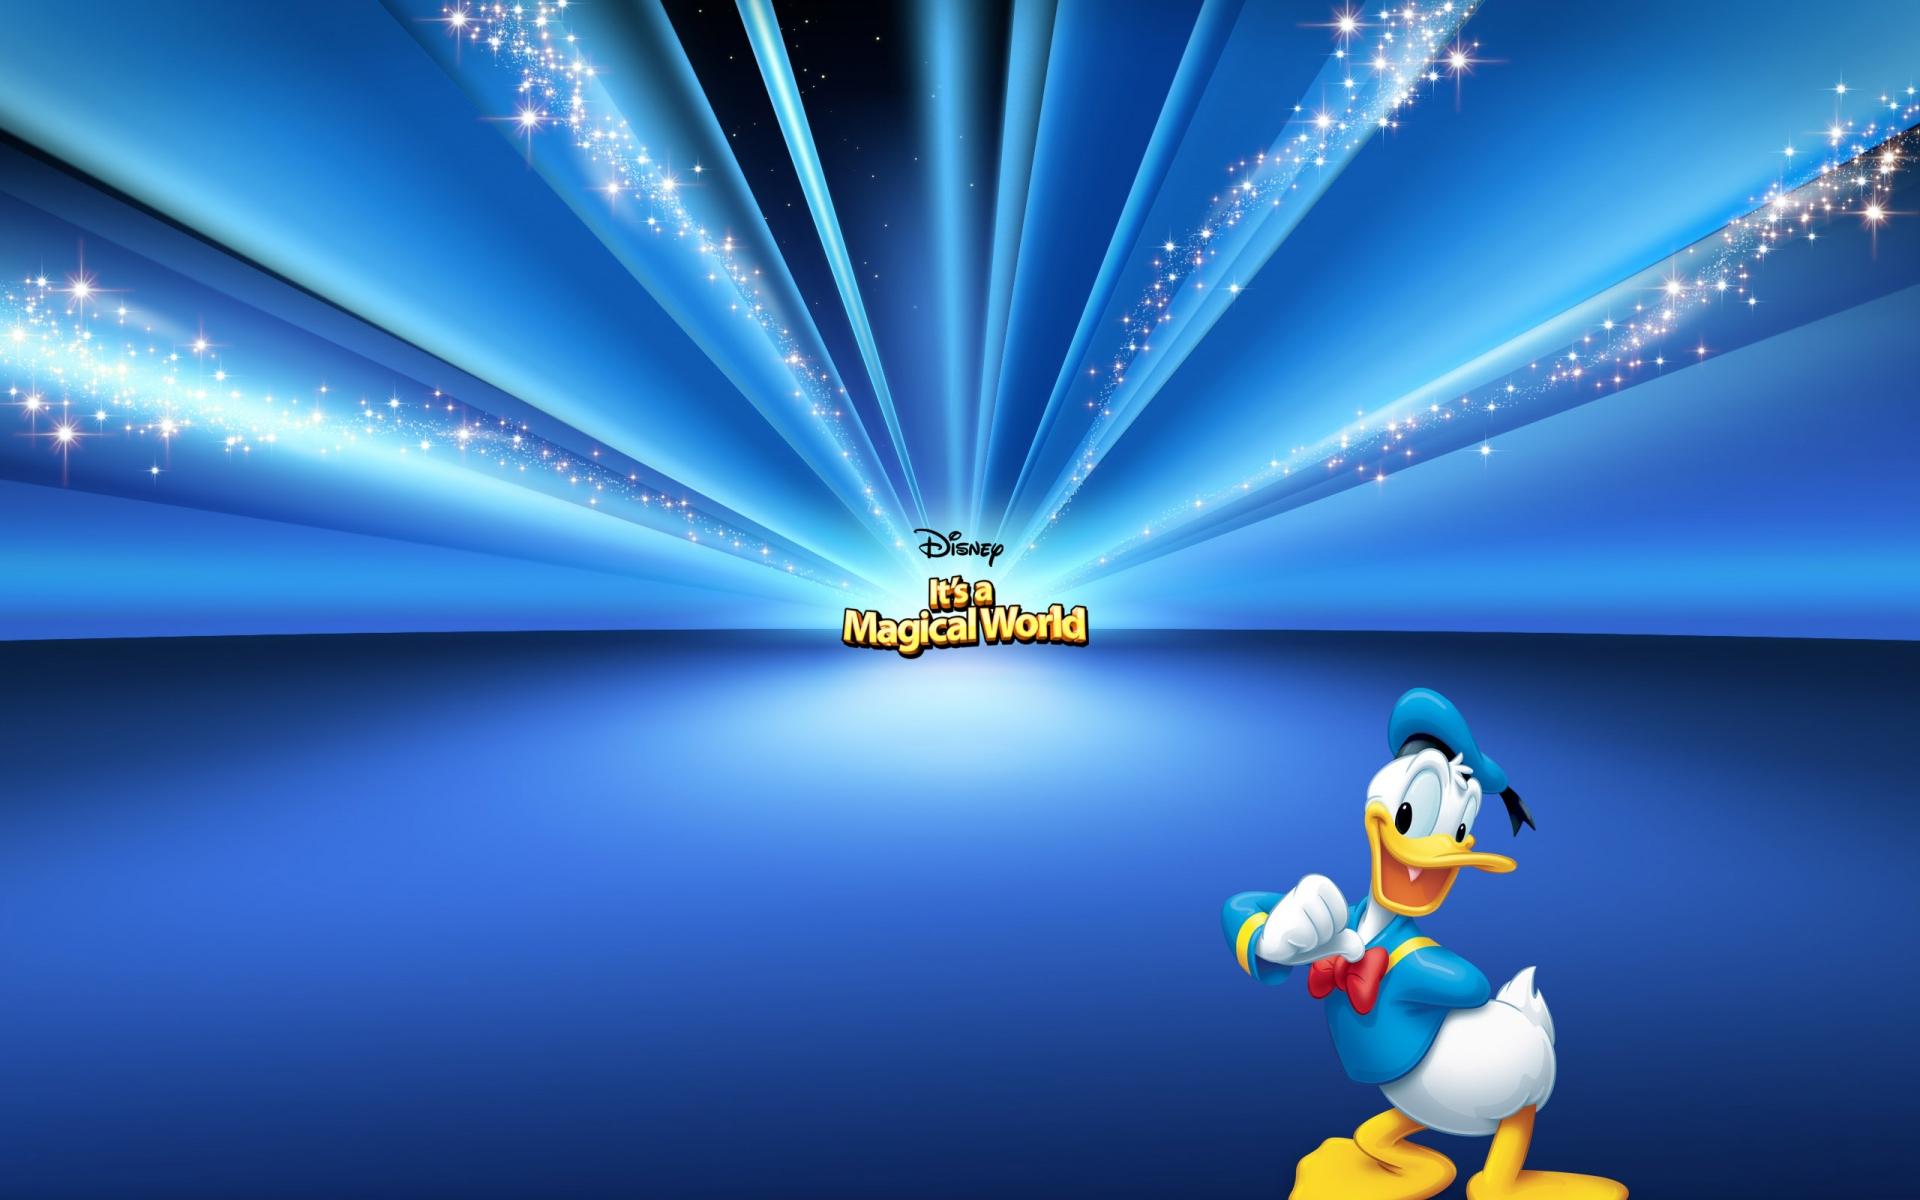 1920x1200 Donald Duck desktop PC and Mac wallpaper 1920x1200